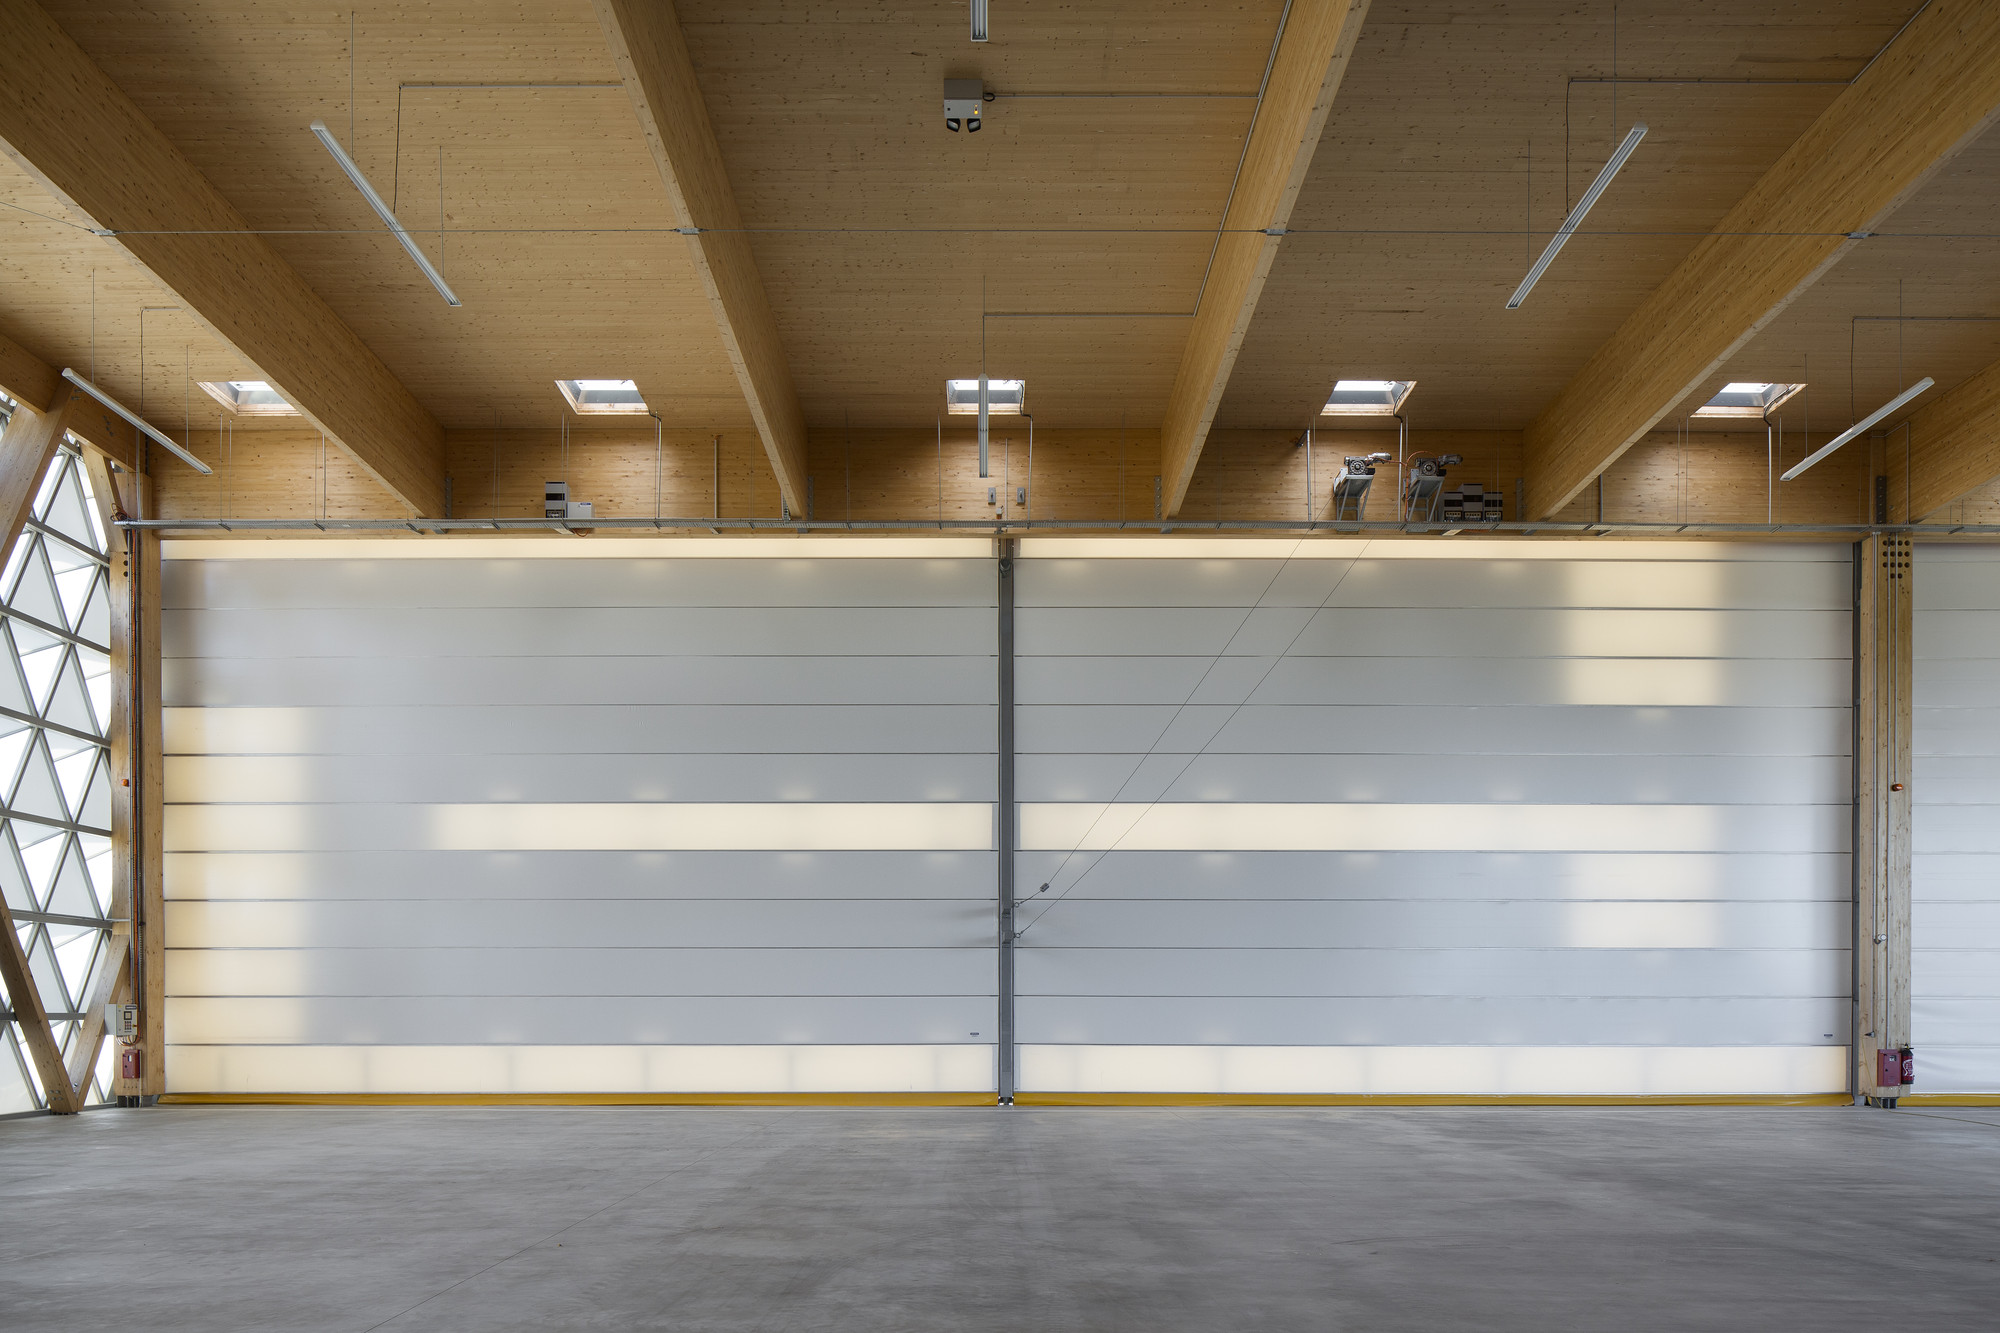 Gallery of hangar h16 comte vollenweider architectes 16 for Architecture hangar